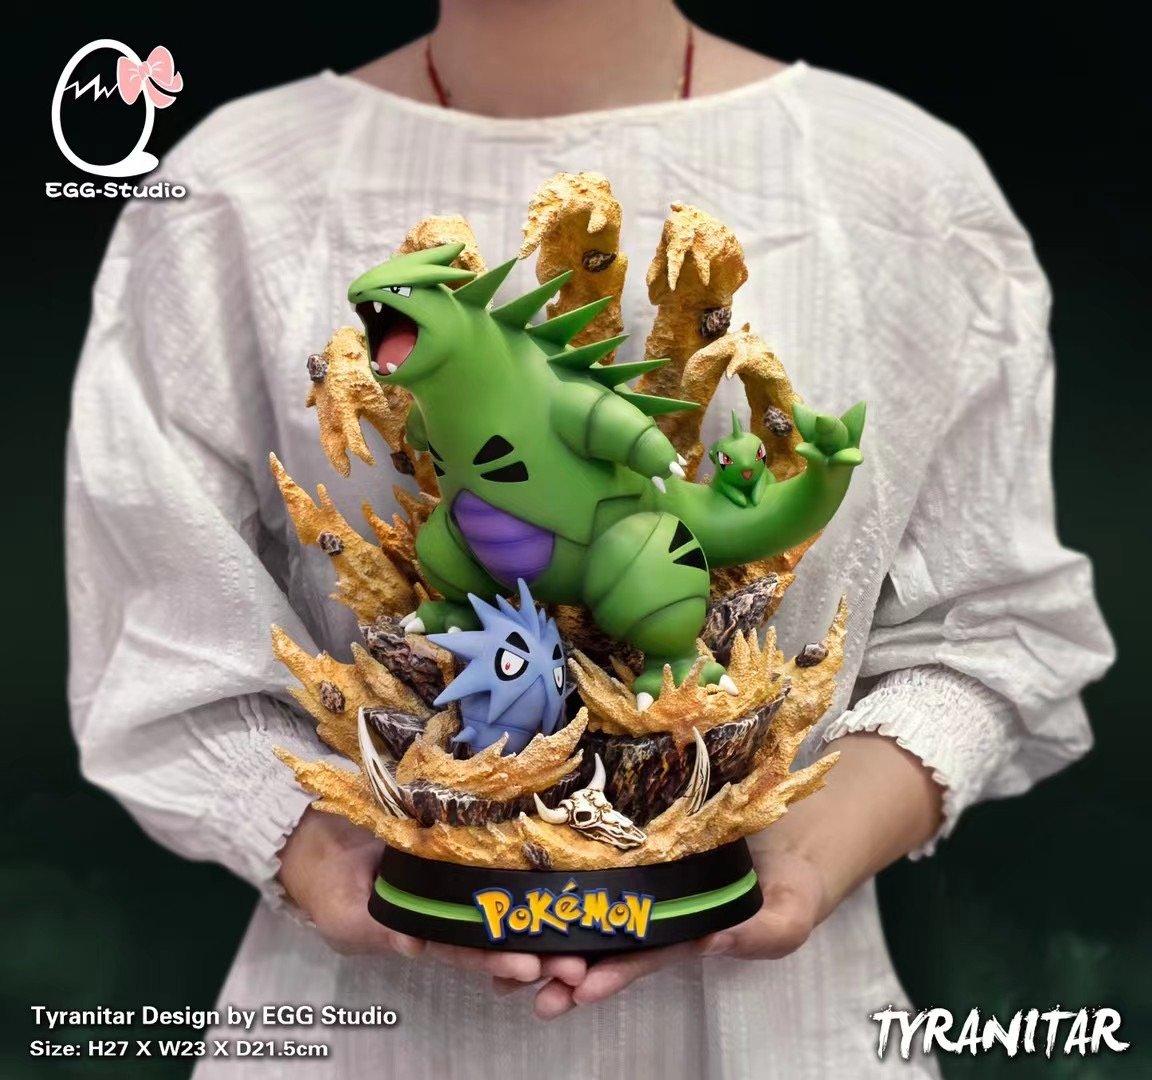 Image of [Pre-Order] Pokemon Egg Studio Resin Tyranitar Statue